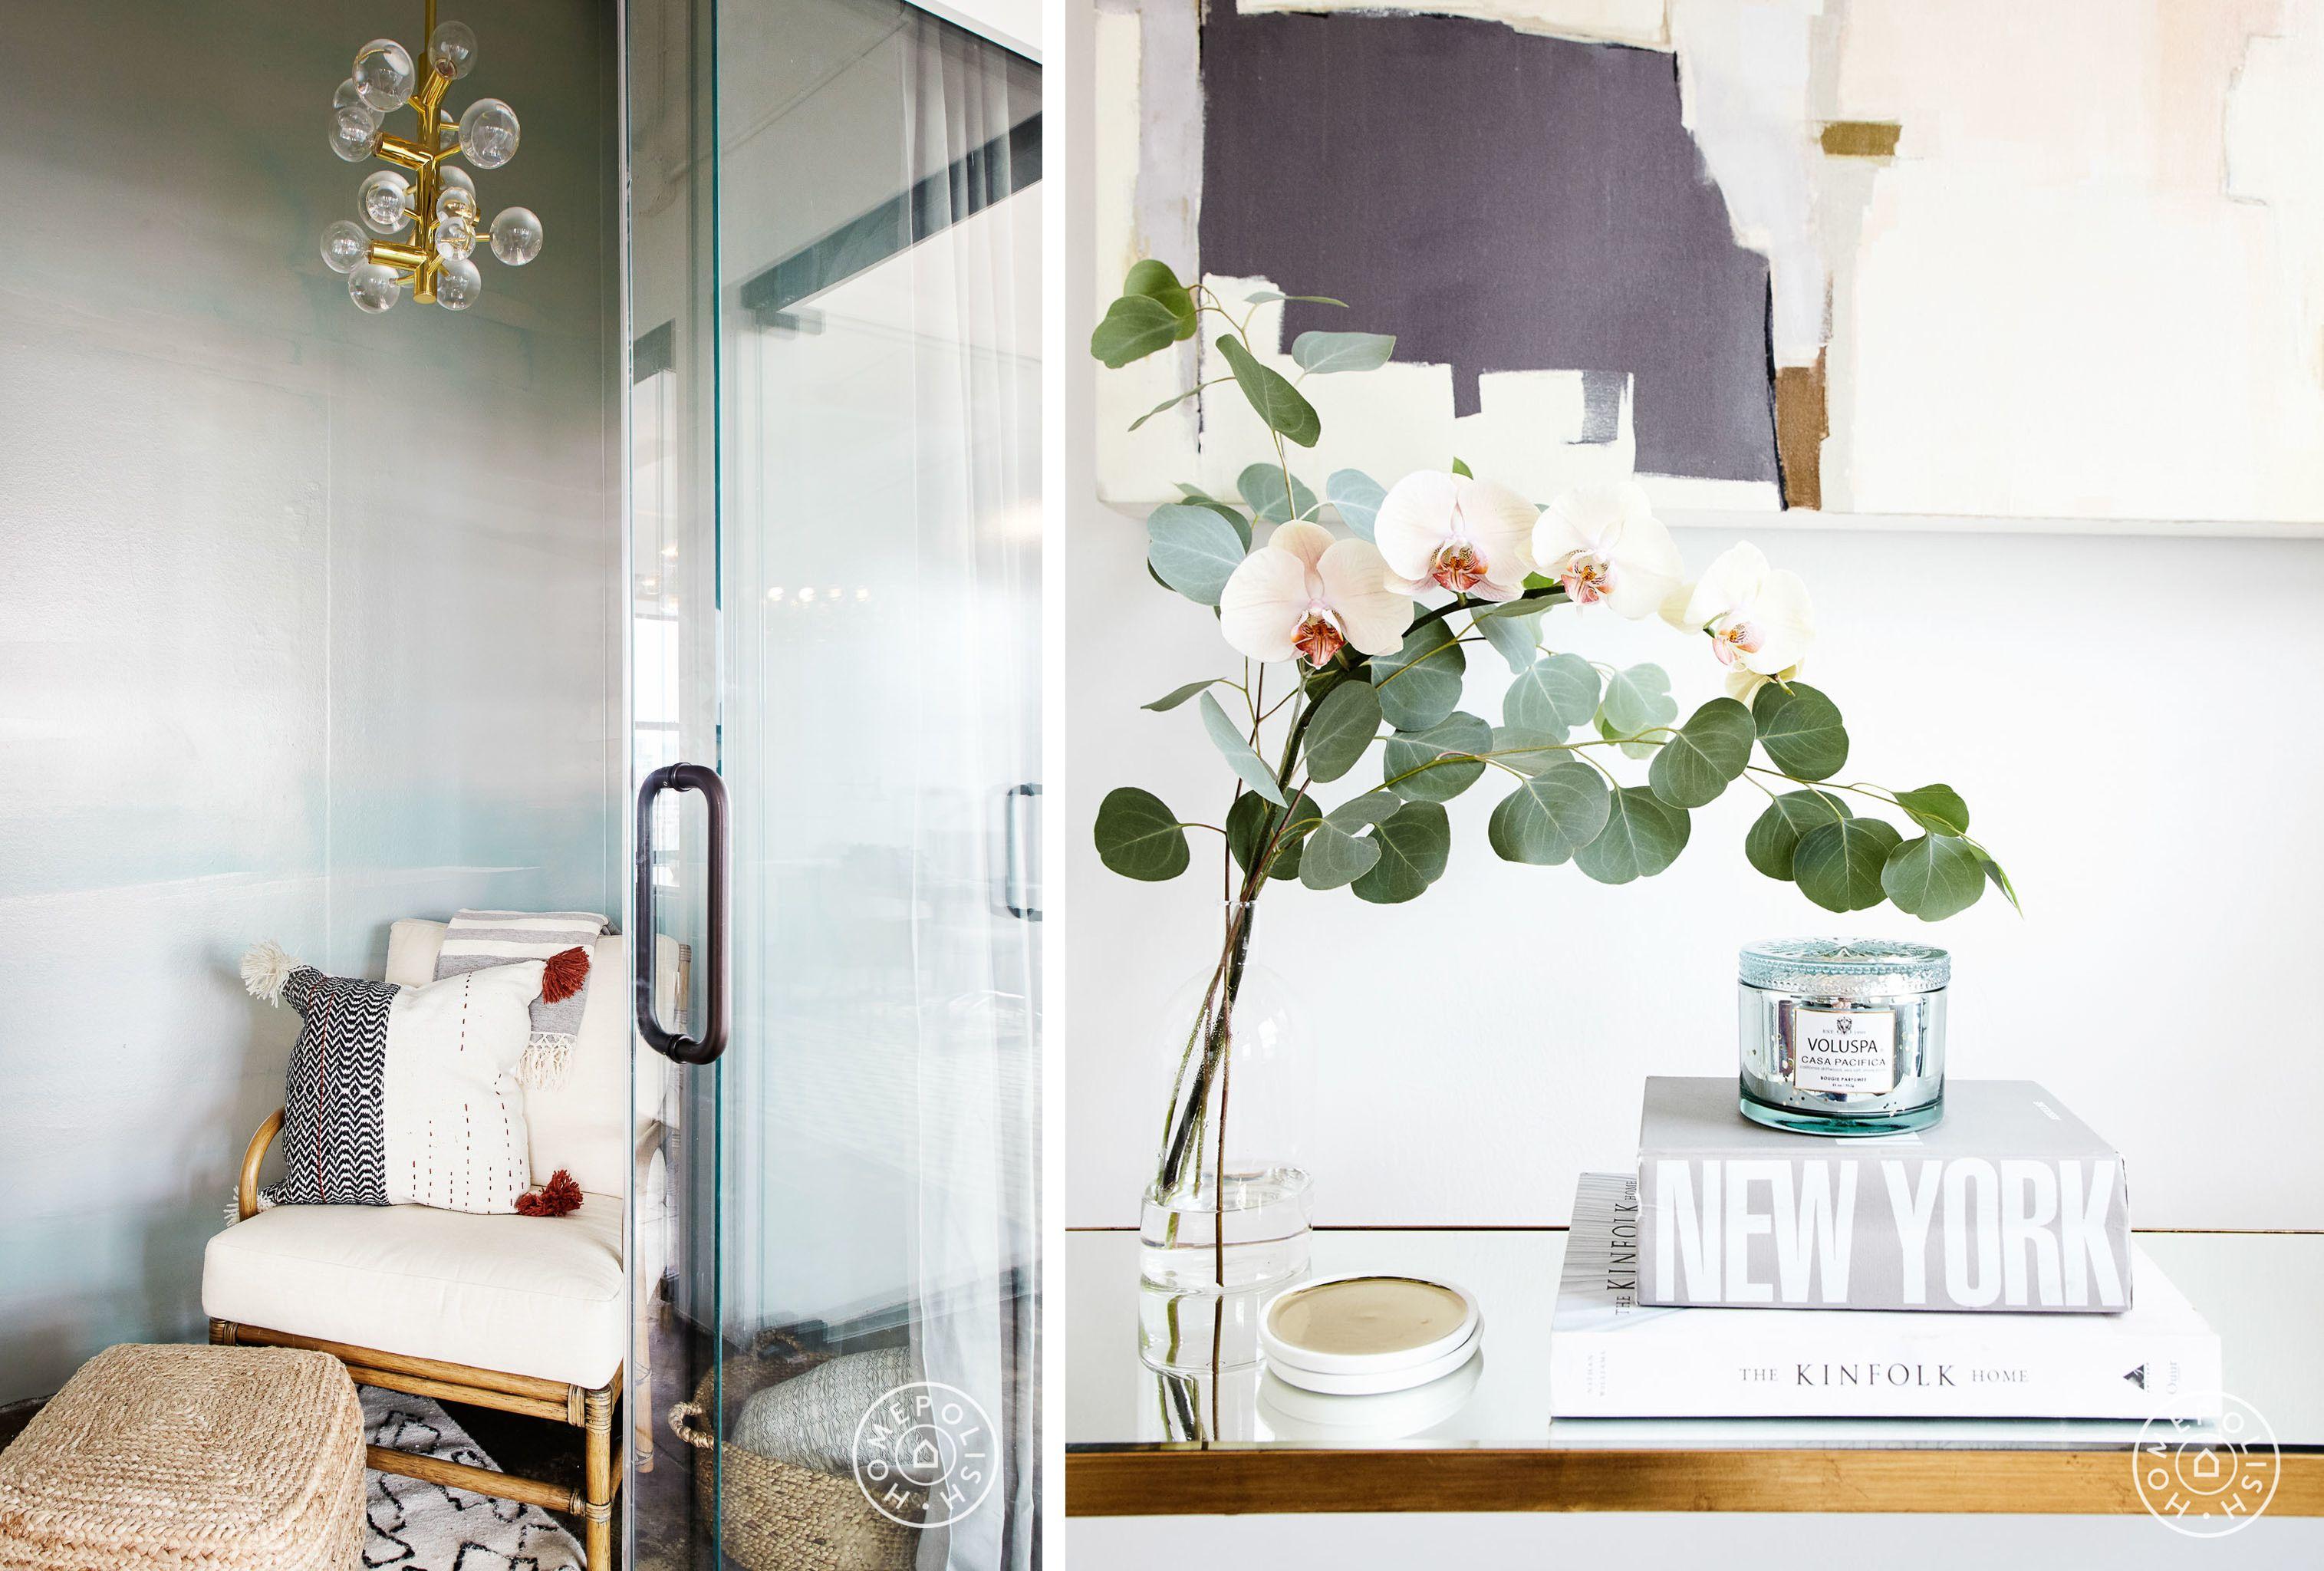 Only floors up from simply gum   home interior design also tour karlie kloss boss office work rh pinterest